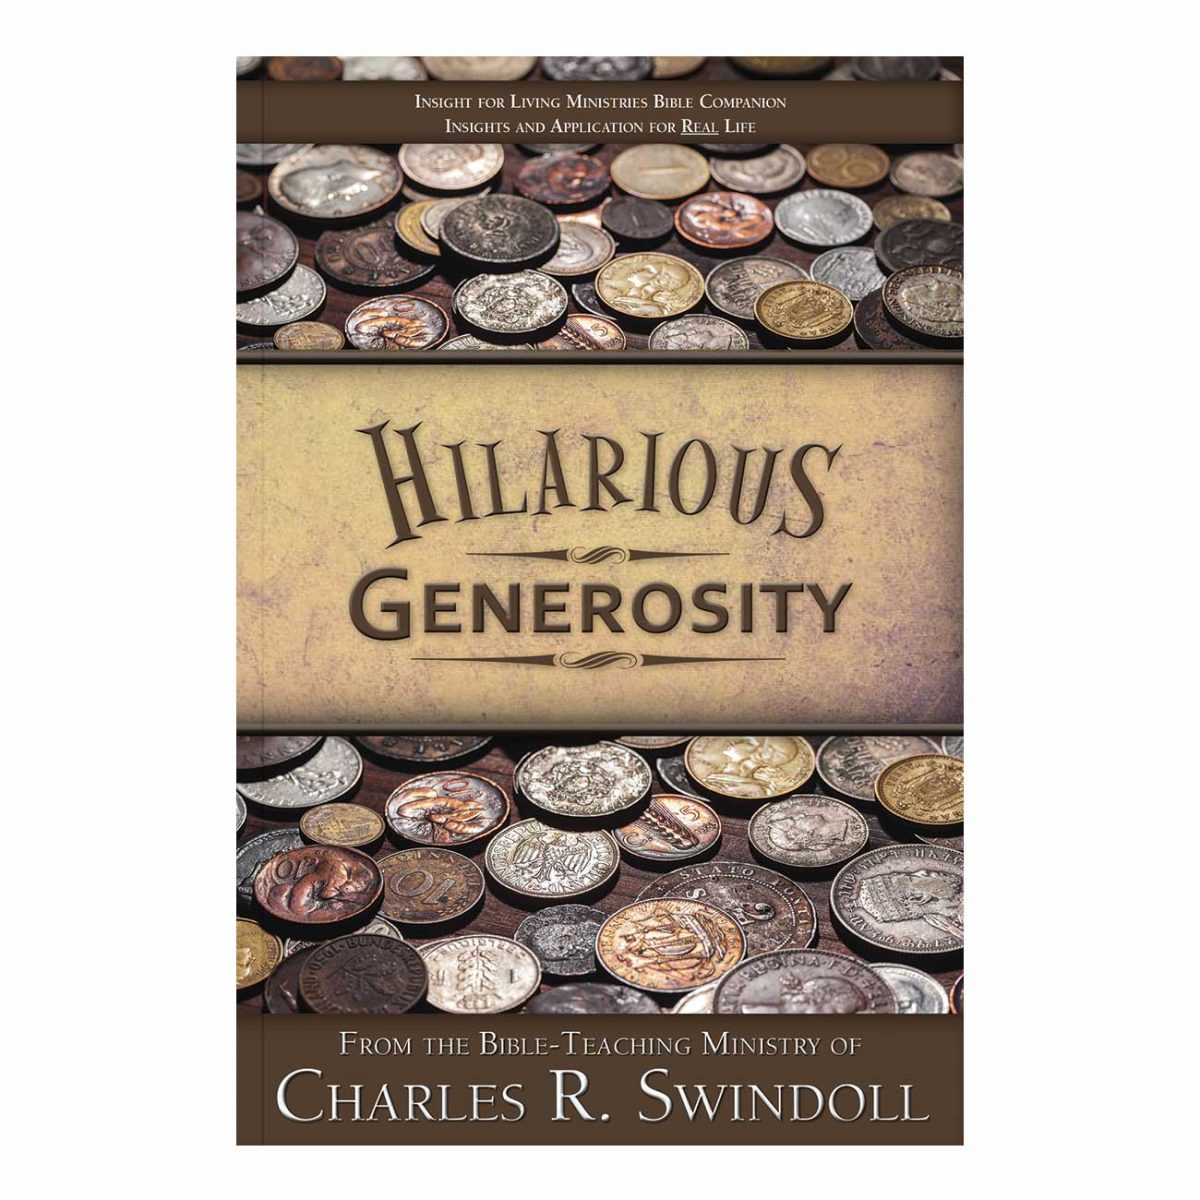 HILARIOUS GENEROSITY, Bible Companion